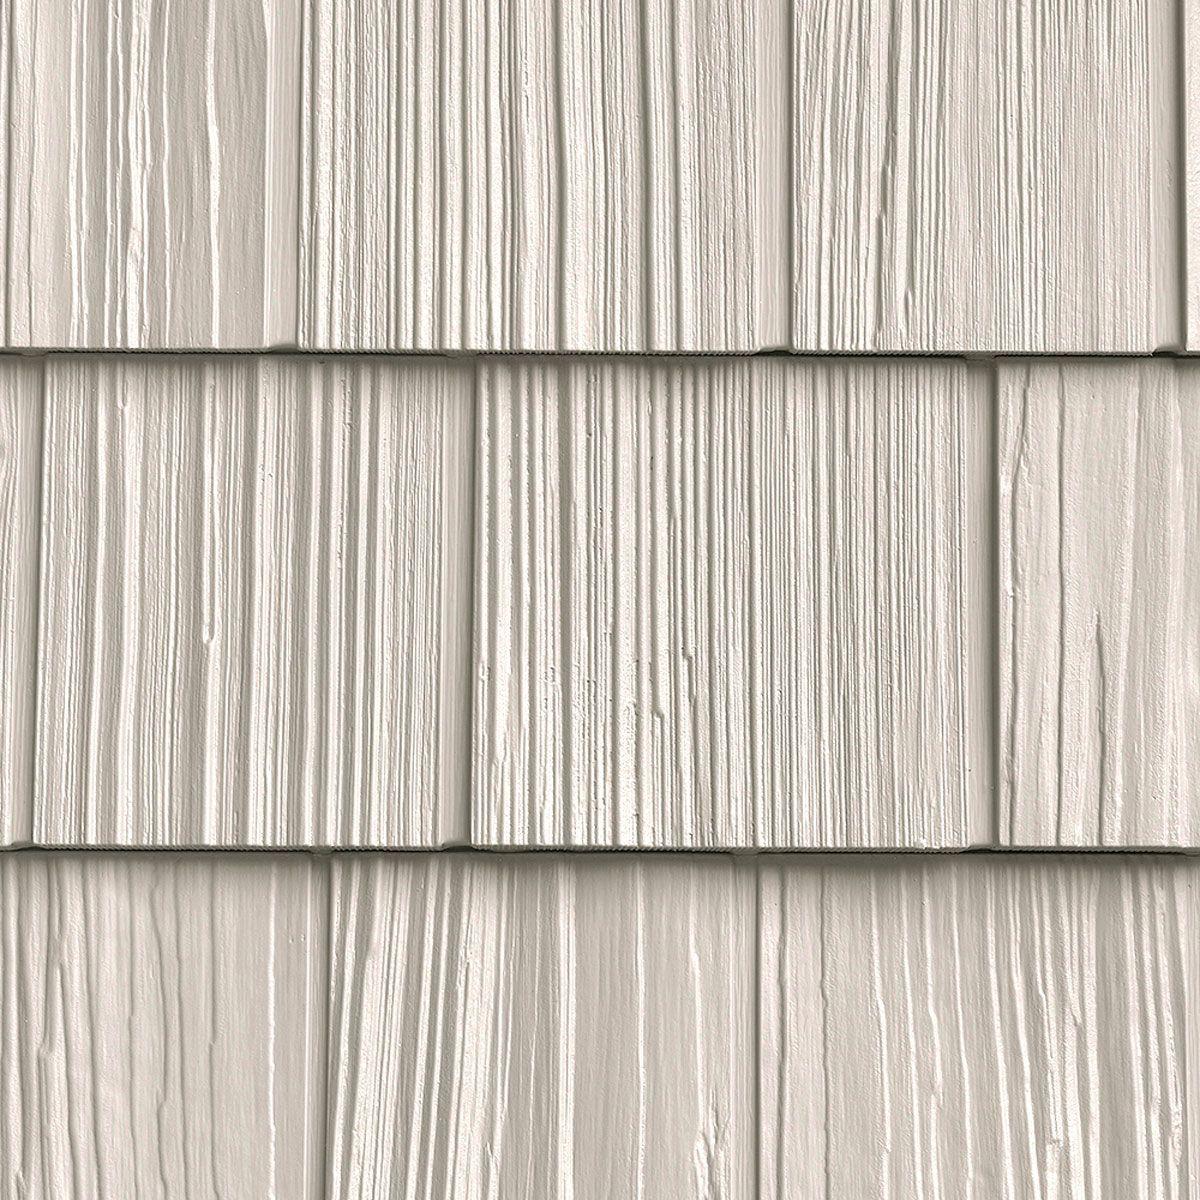 7 W X 60 3 4 L Exposure Vinyl Split Shakes 34 Panels Ctn 100 Sq Feet 834 Red Cedar Walmart Com In 2020 Vinyl Cedar Shake Siding Vinyl Shake Siding Vinyl Siding